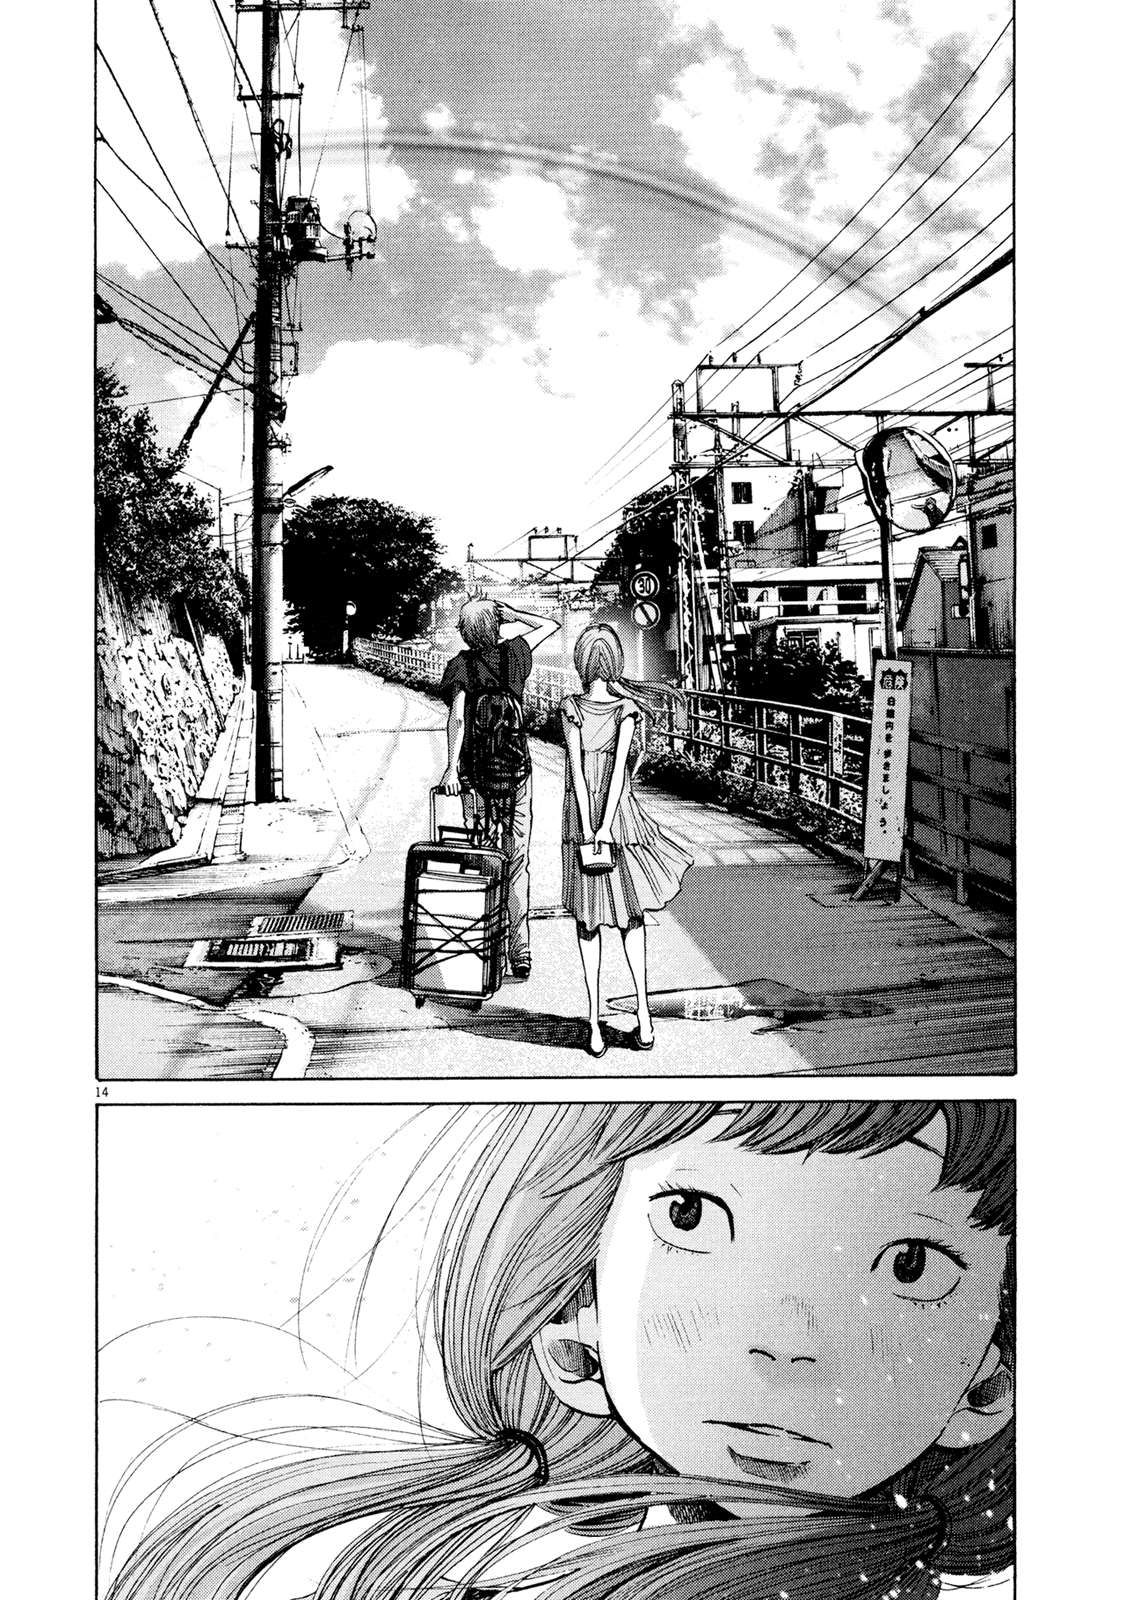 Sekai No Owari to Yoake Mae Manga, Como desenhar mangá